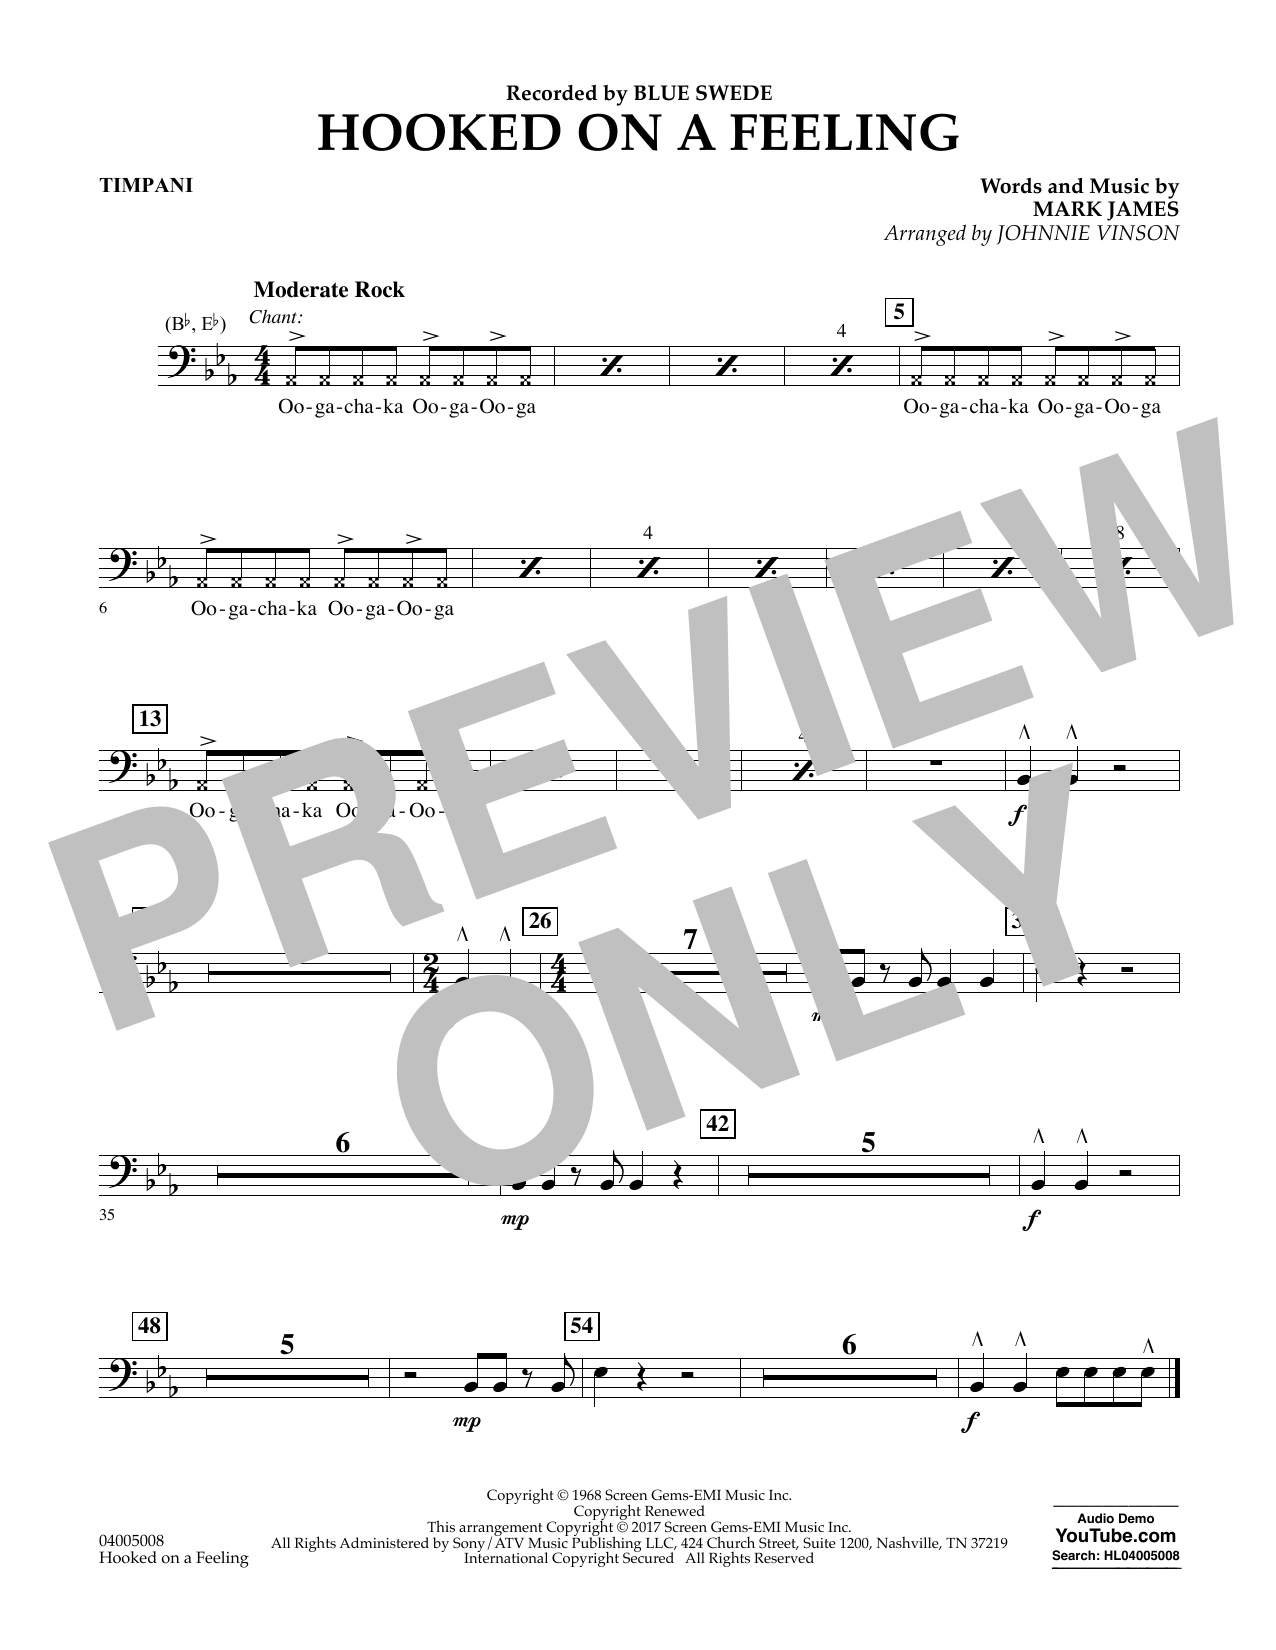 Hooked on a Feeling - Timpani Sheet Music